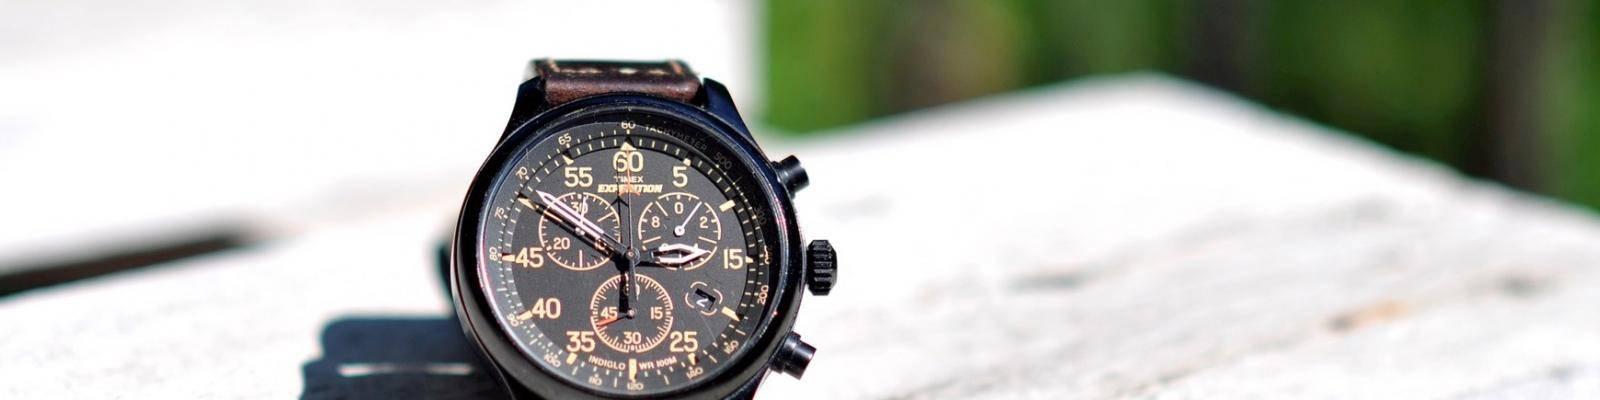 Horloge en papierwerk